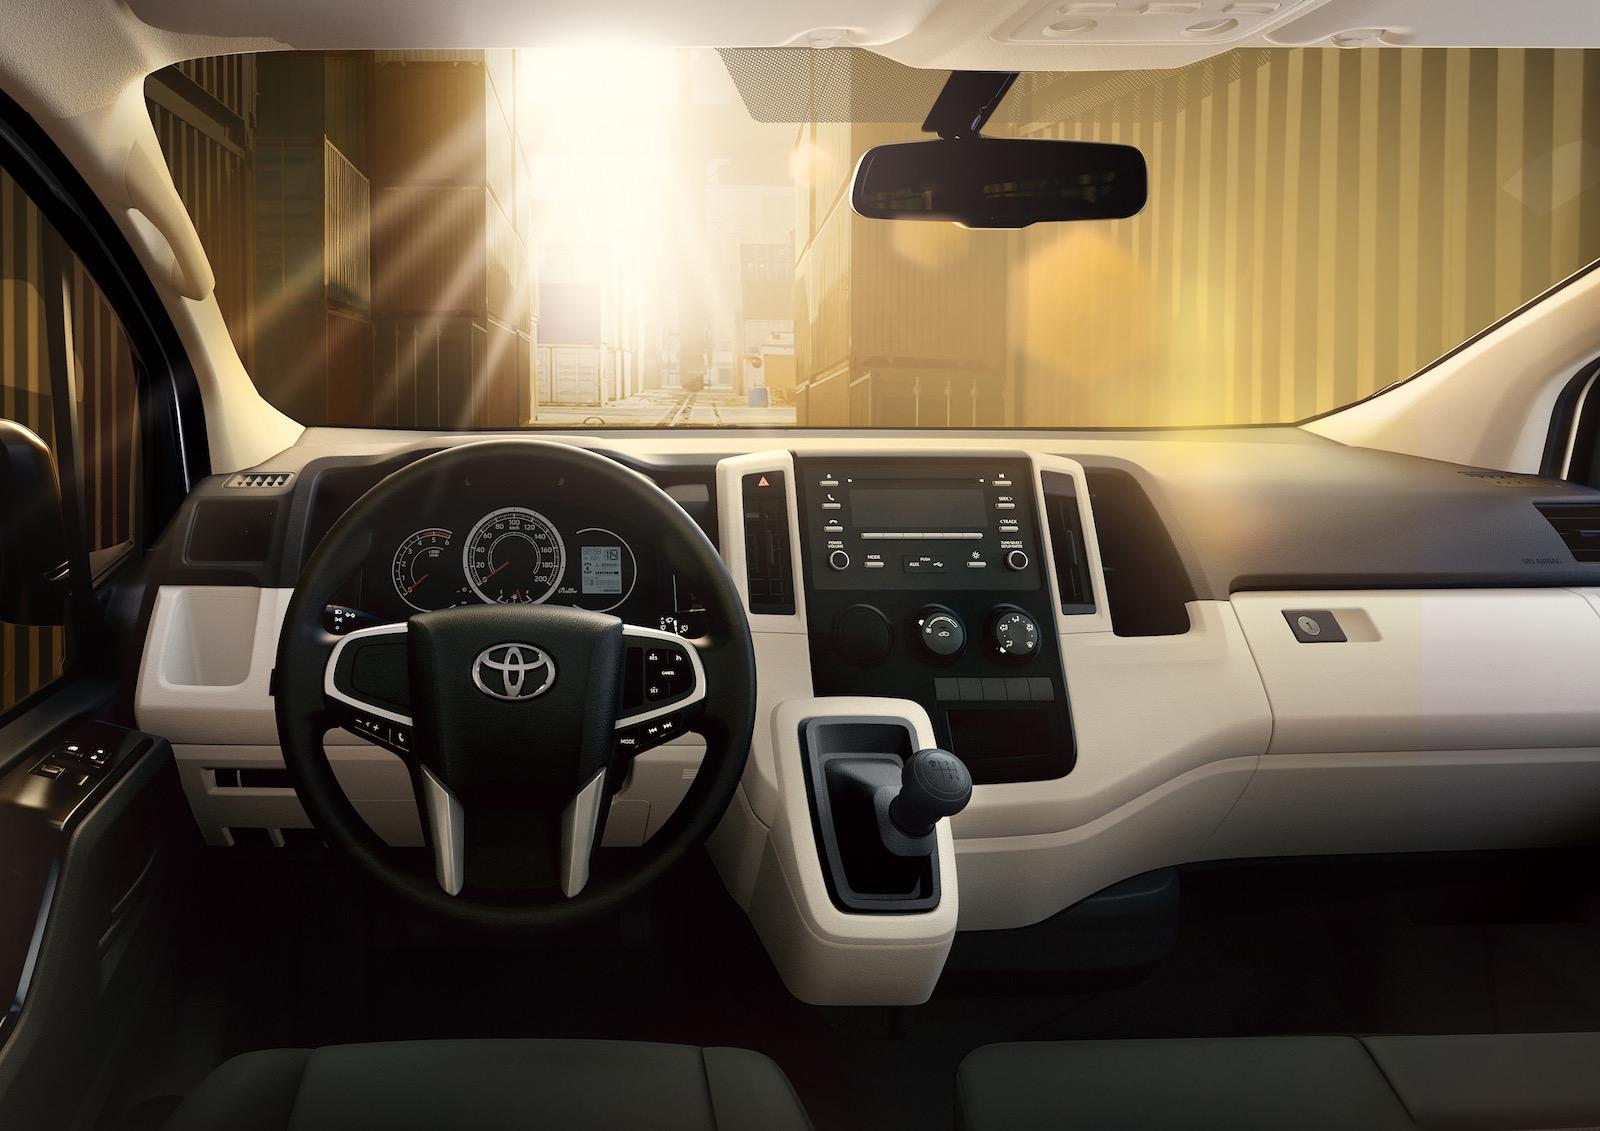 2020 Toyota HiAce revealed, gets powerful V6 option ...